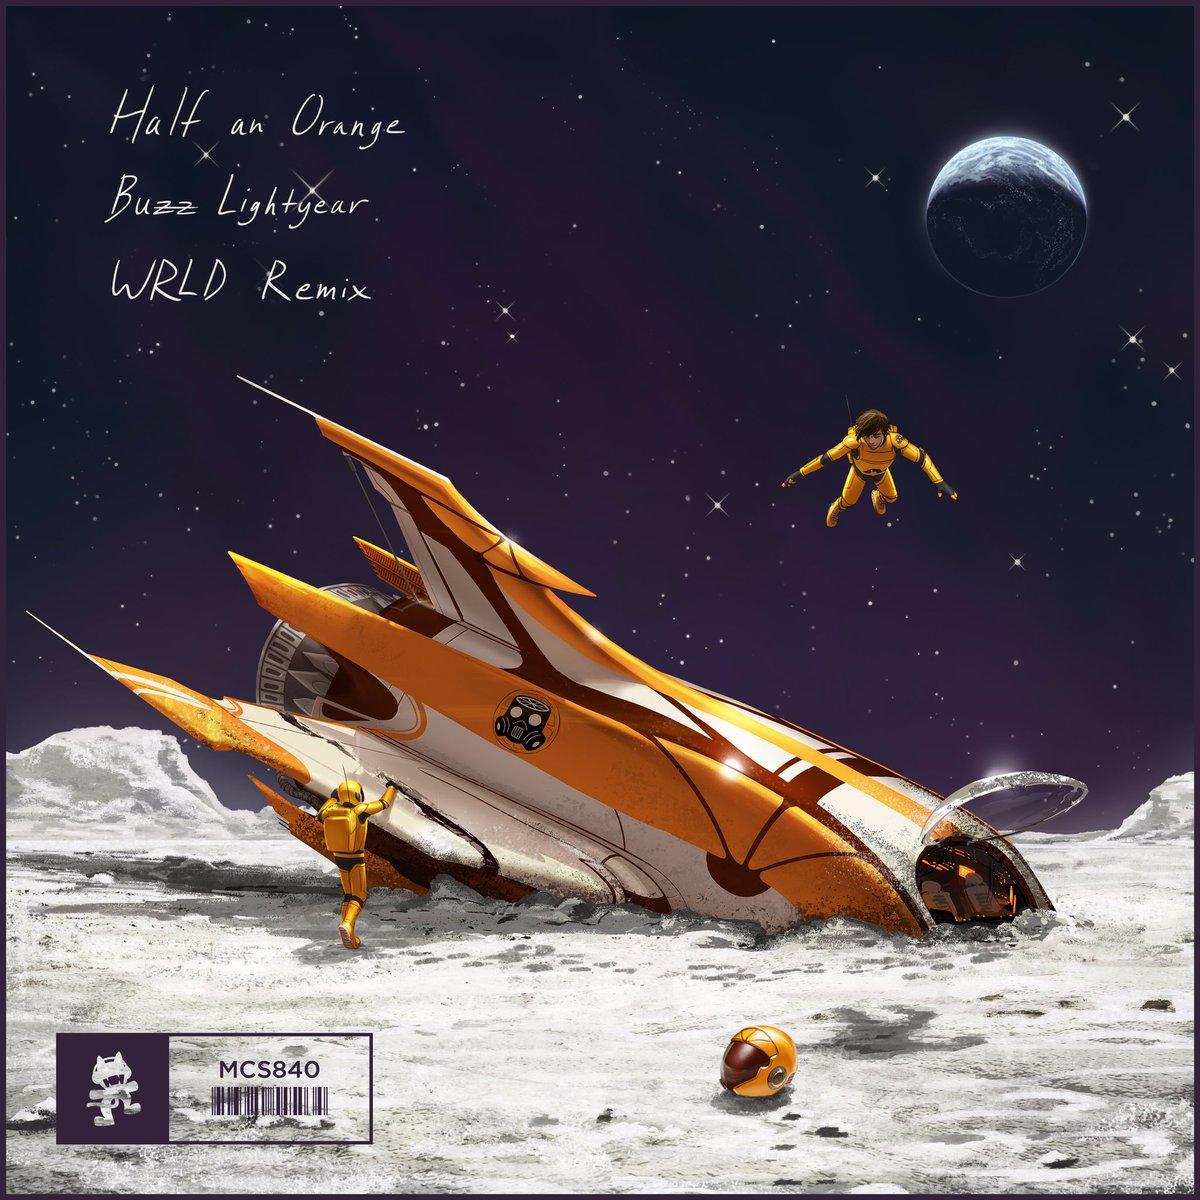 Buzz Lightyear (WRLD Remix)